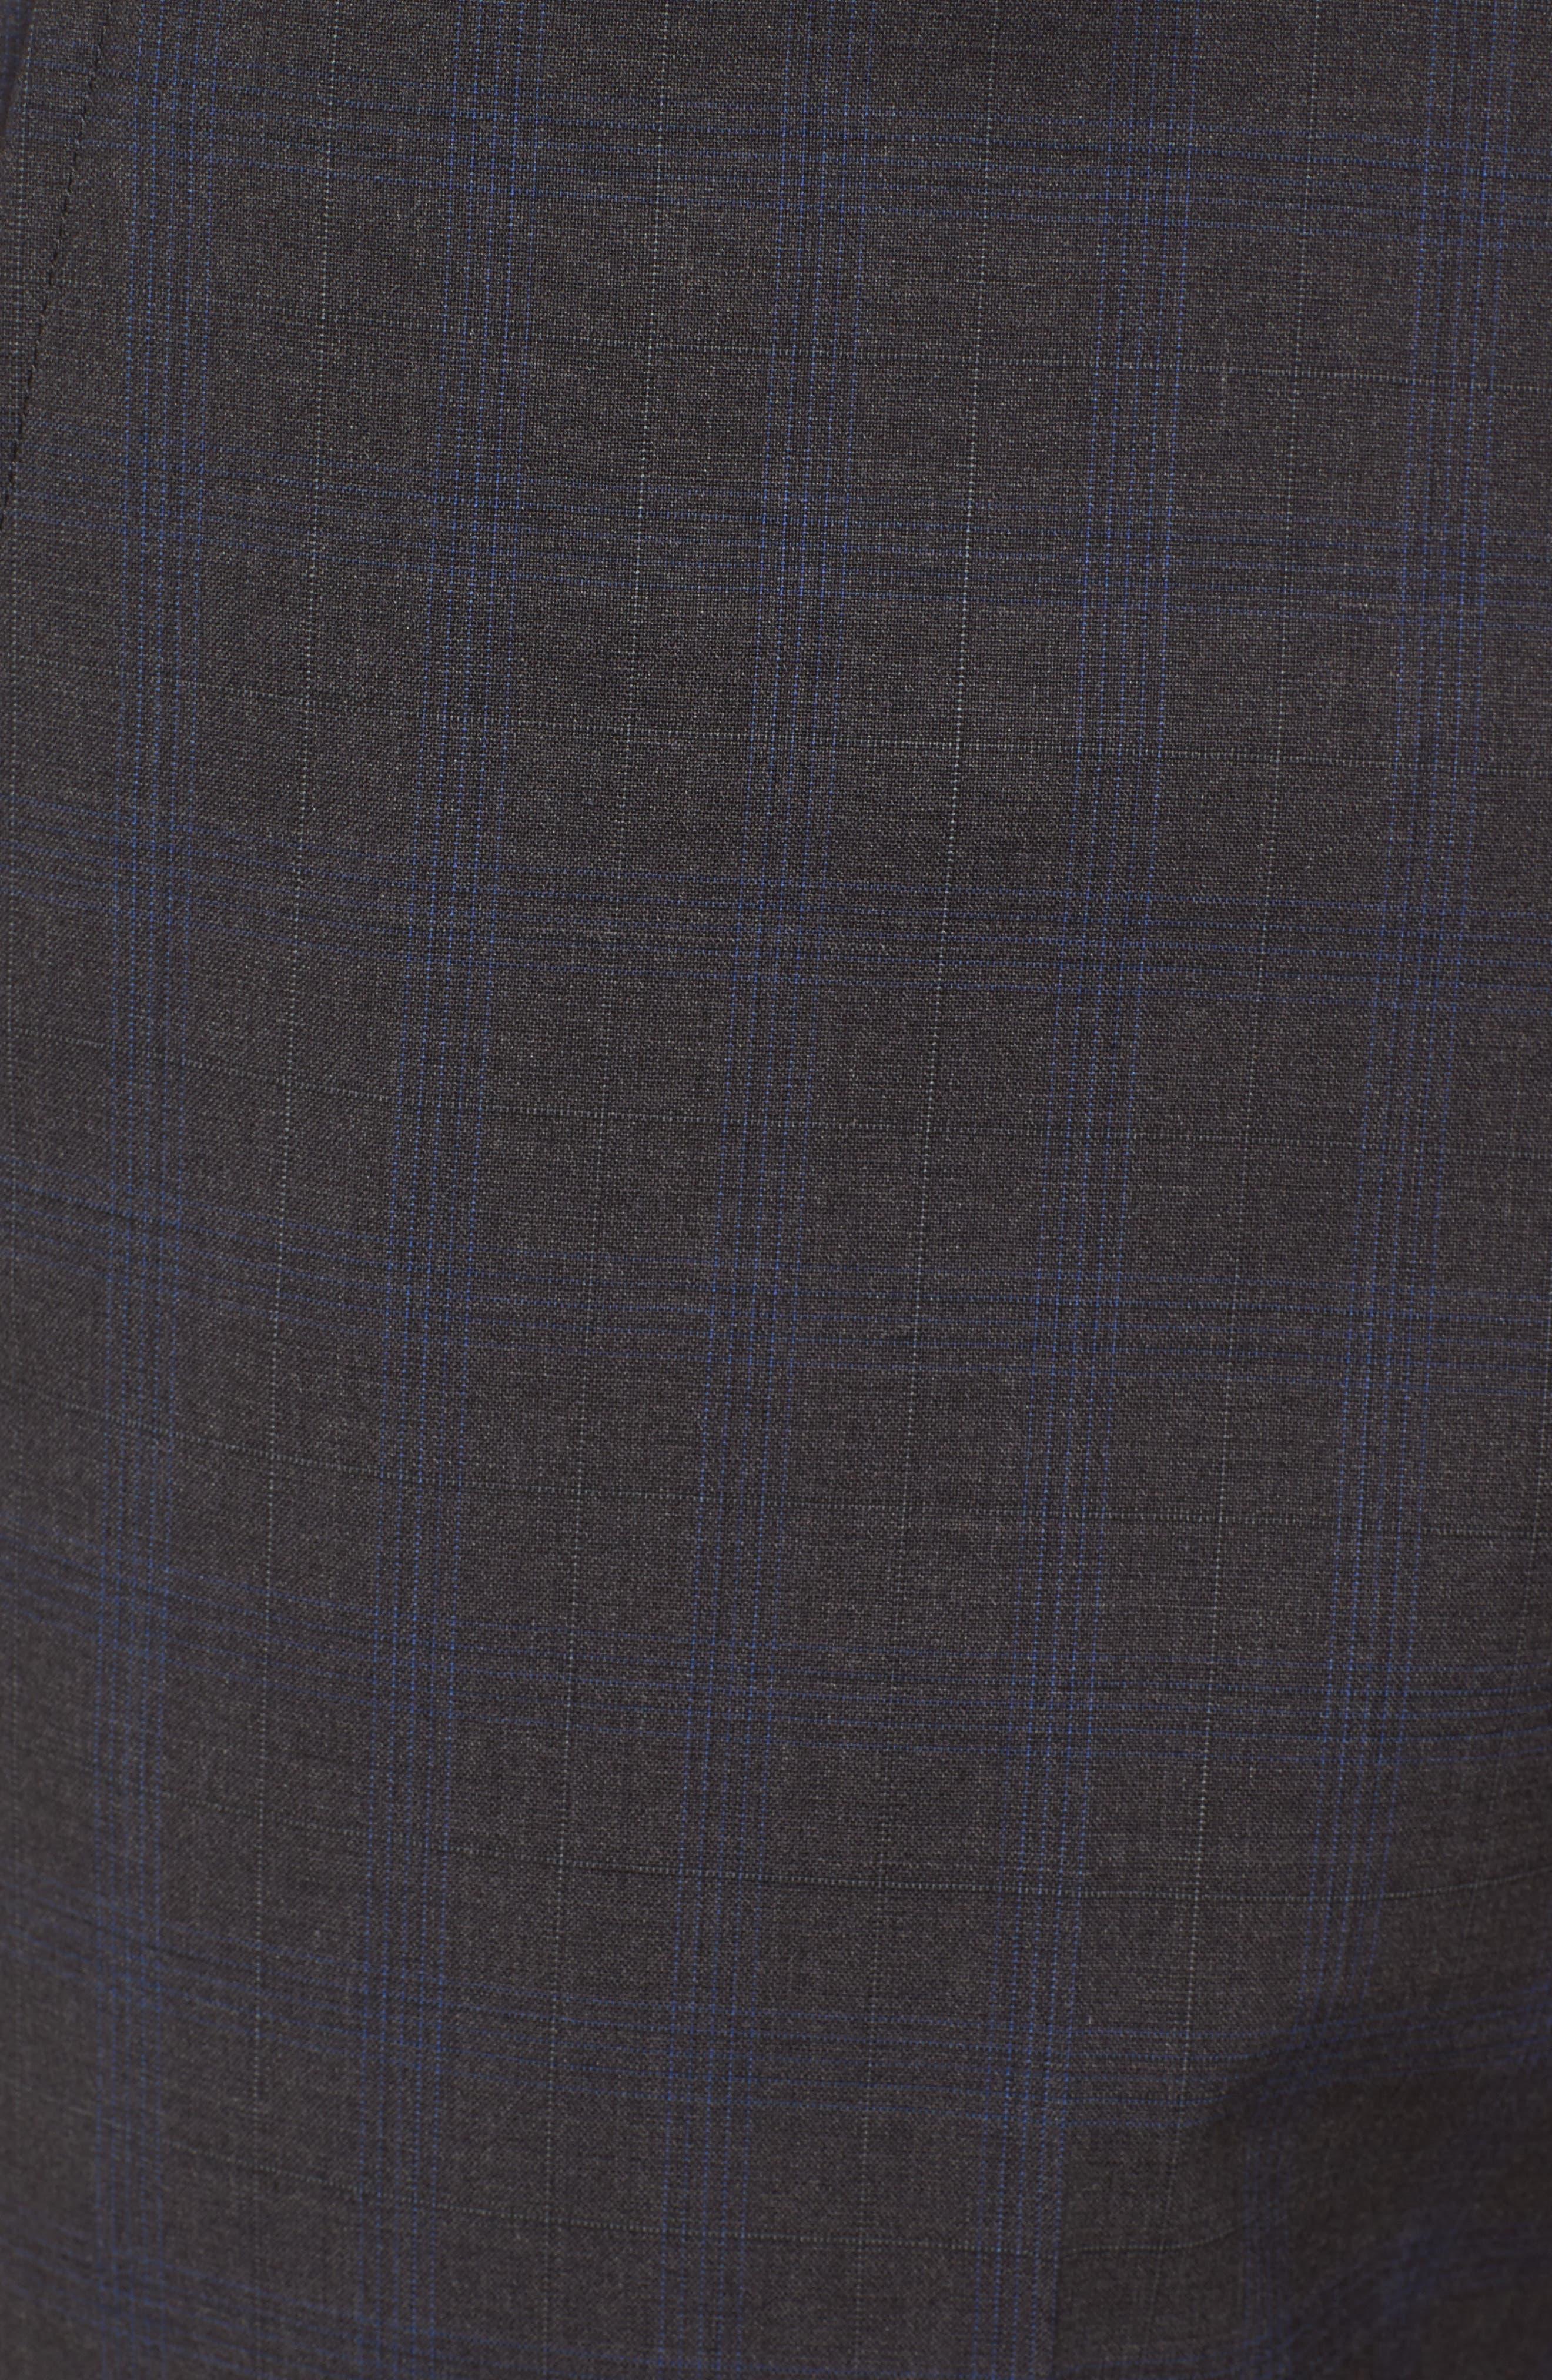 Marlo Trim Fit Tonal Plaid Trousers,                             Alternate thumbnail 5, color,                             053